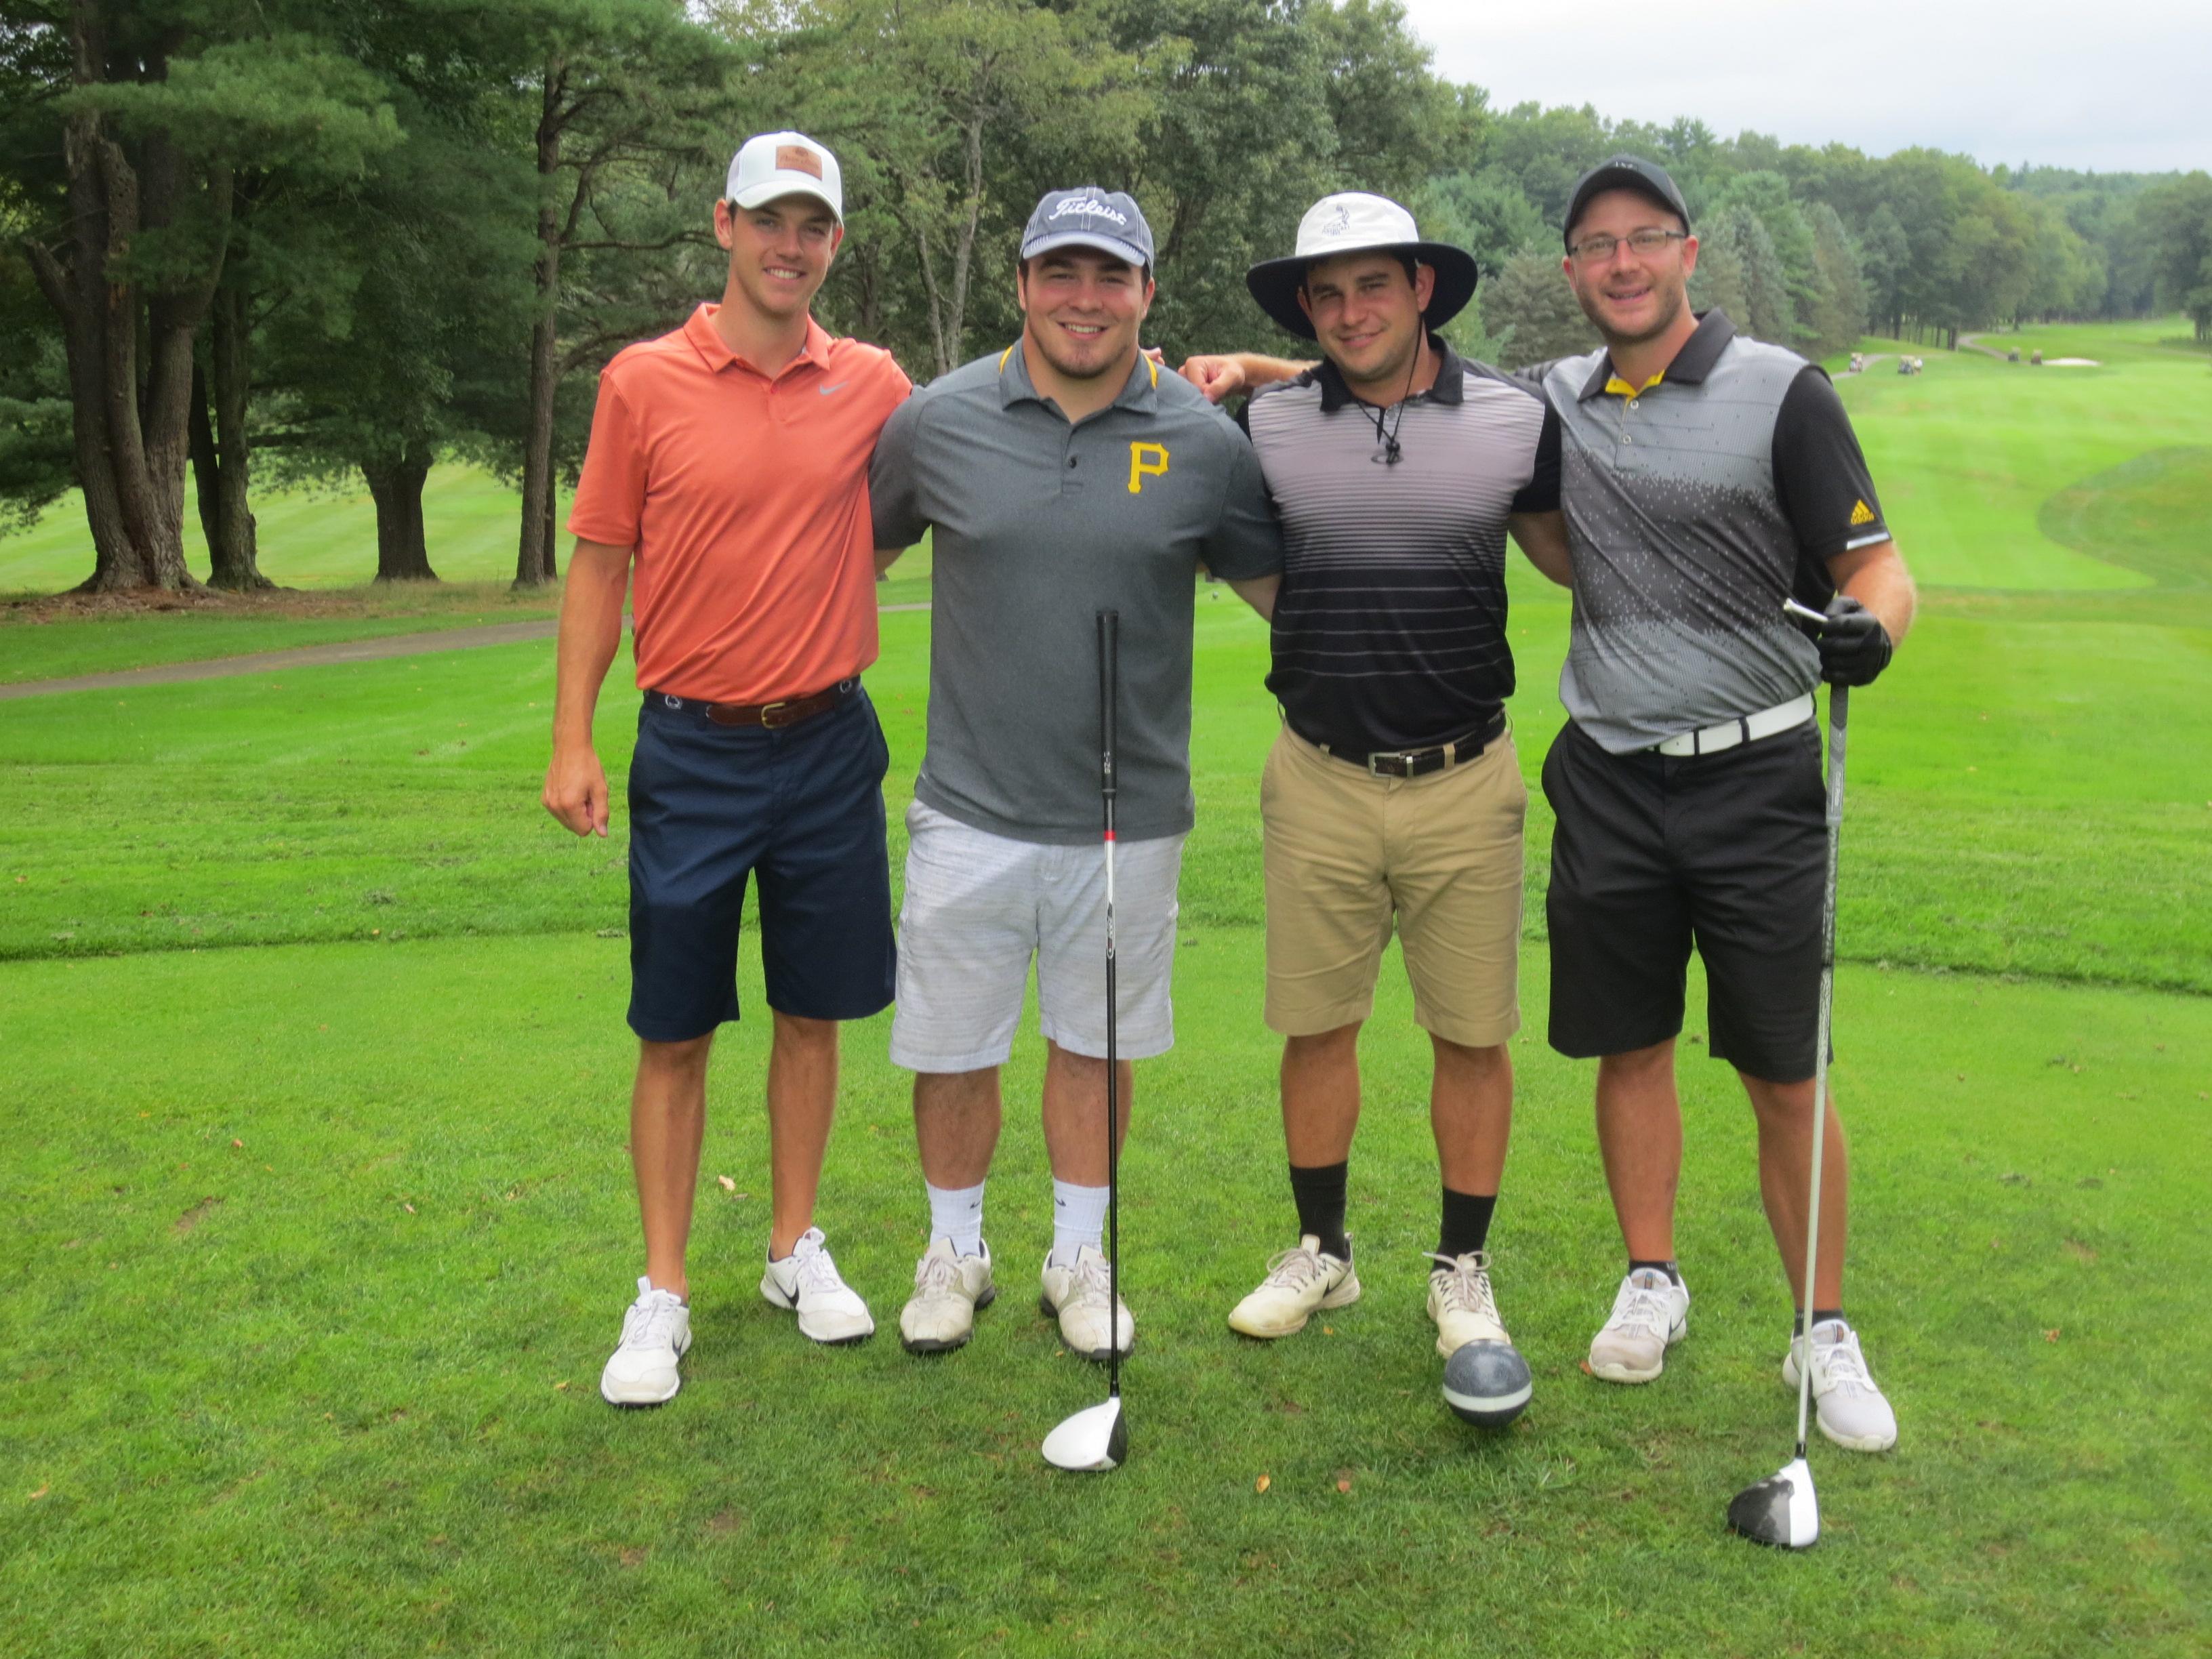 Christian Elliot, Matt McCutcheon, Eric Weyant, Nick Stone